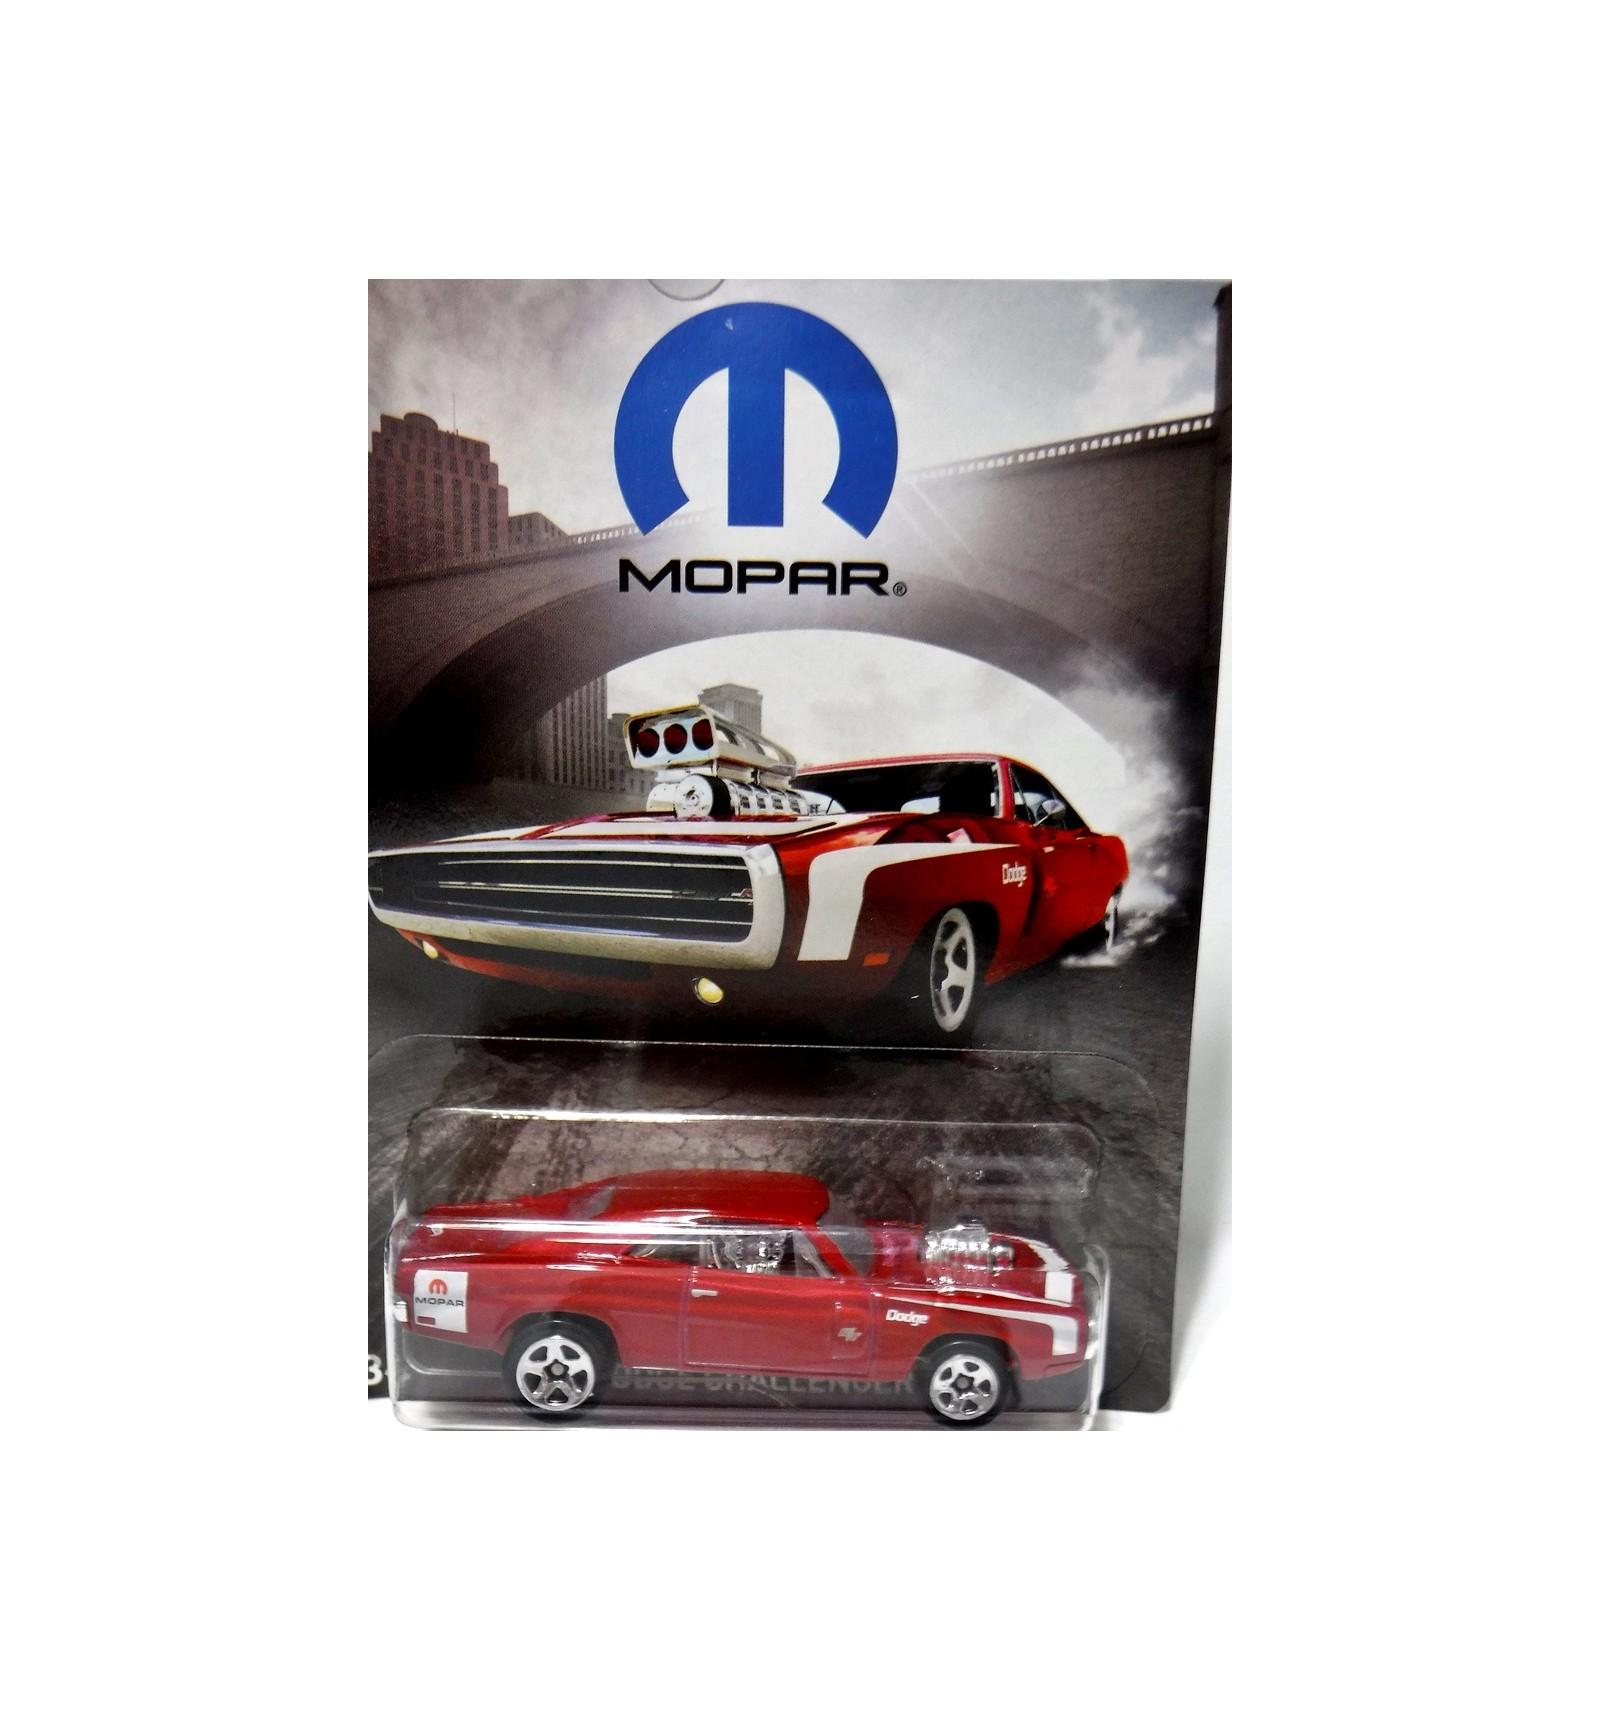 Hot Wheels Mopar Series 1970 Dodge Charger R T Global Diecast